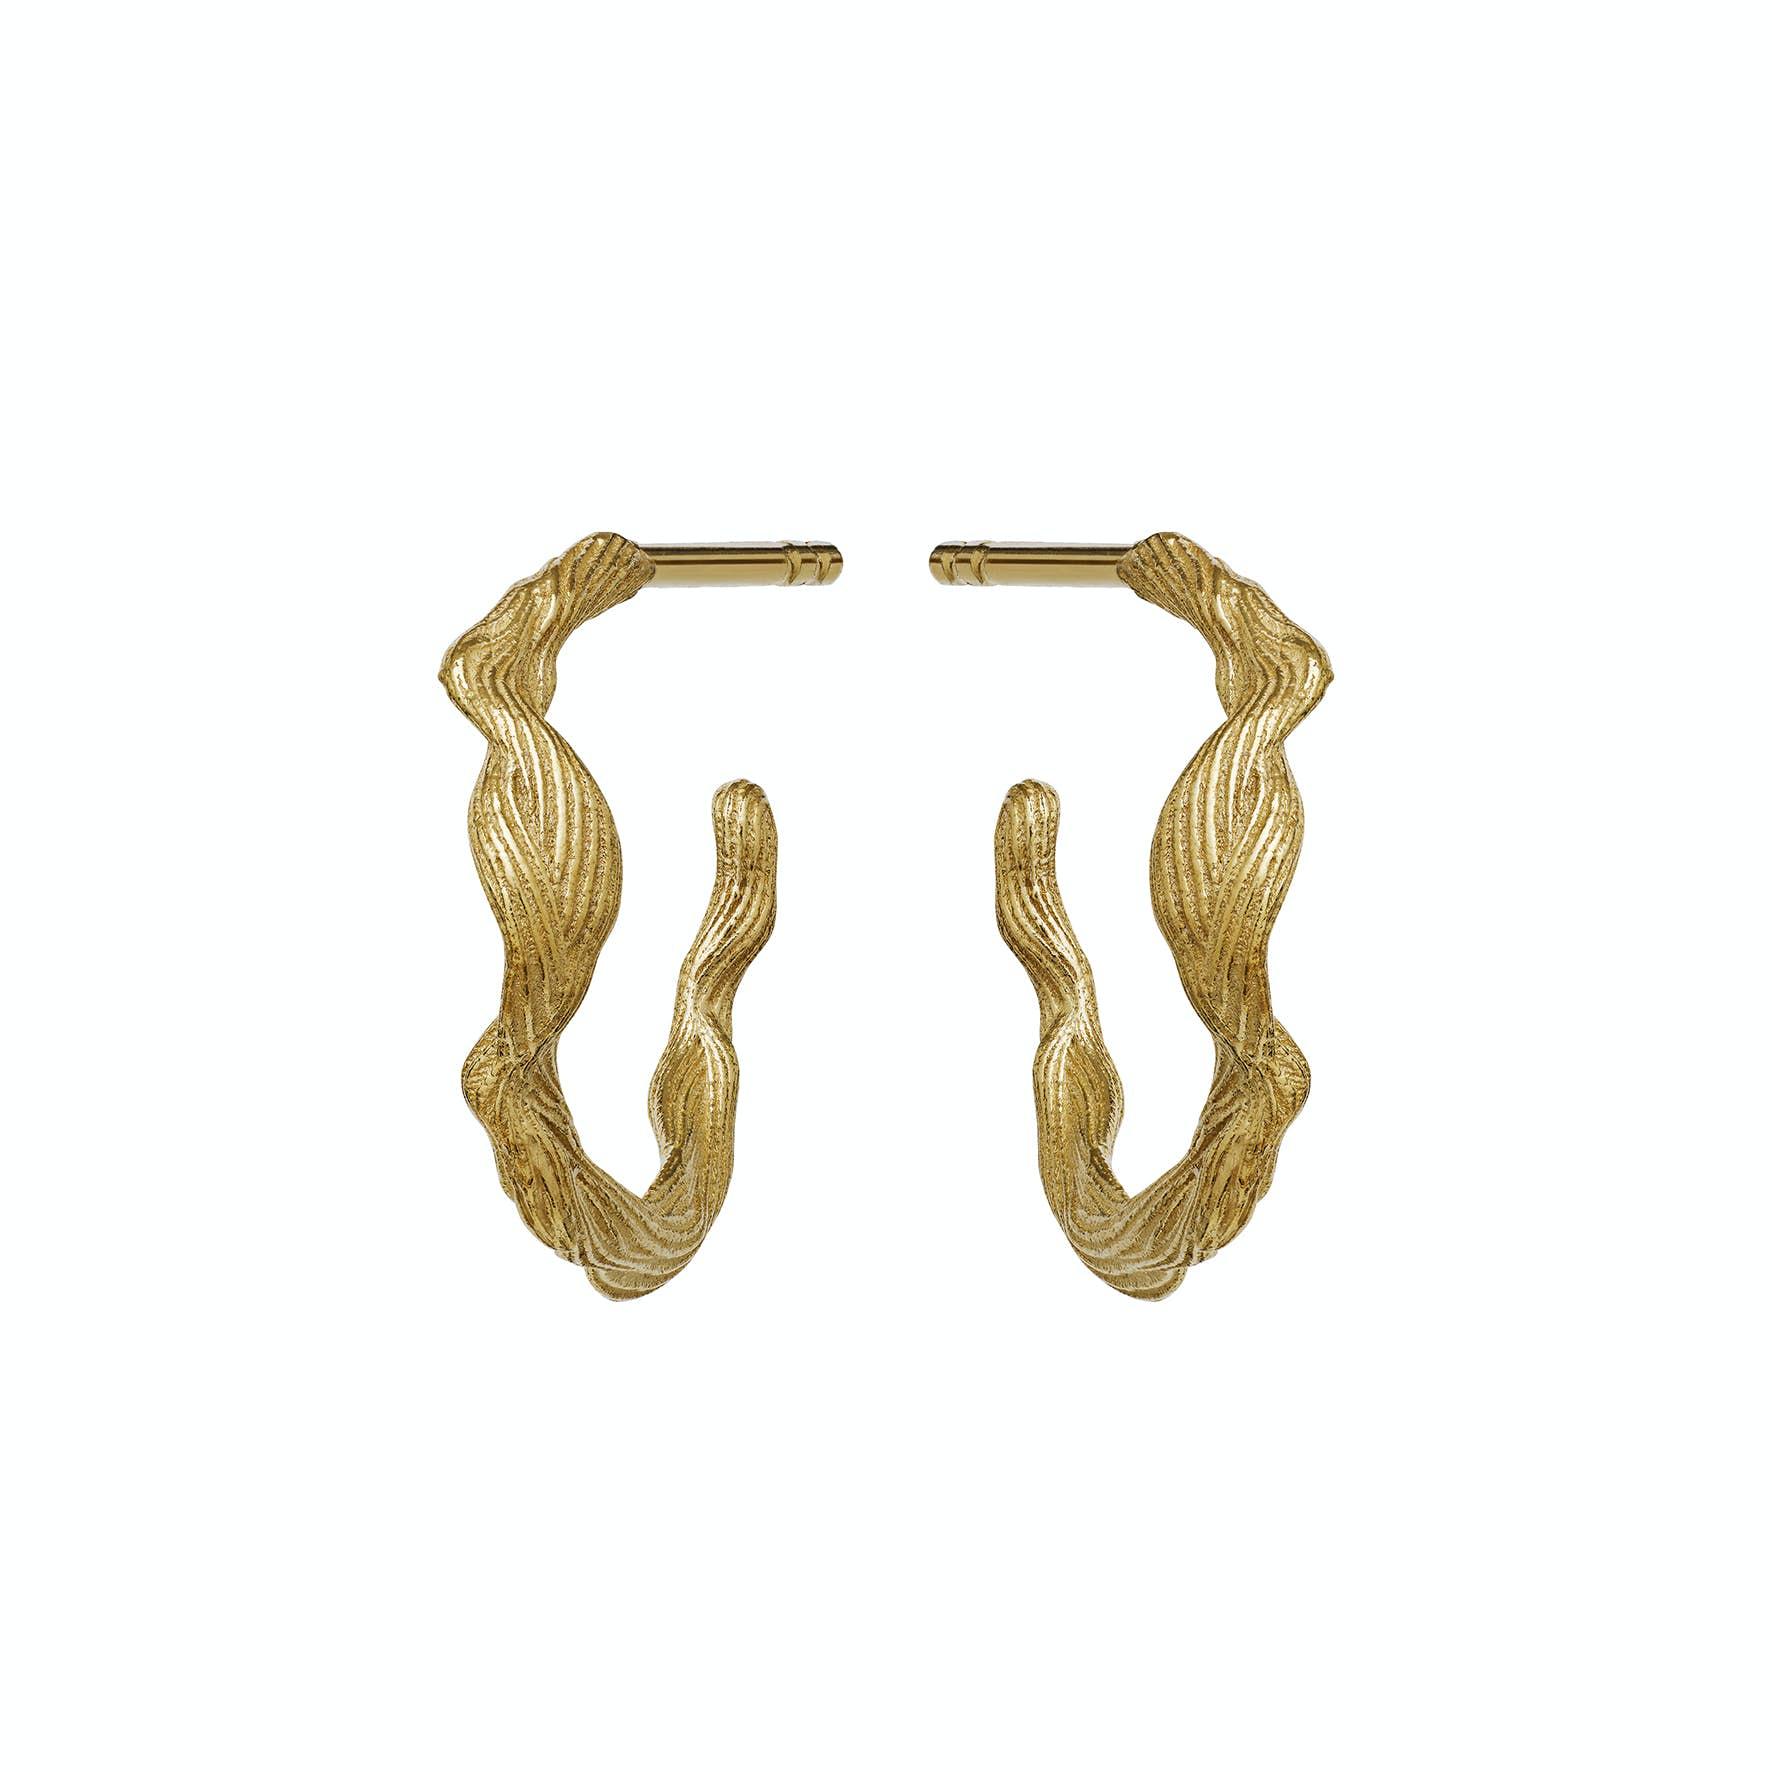 Ara Earrings von Maanesten in Vergoldet-Silber Sterling 925